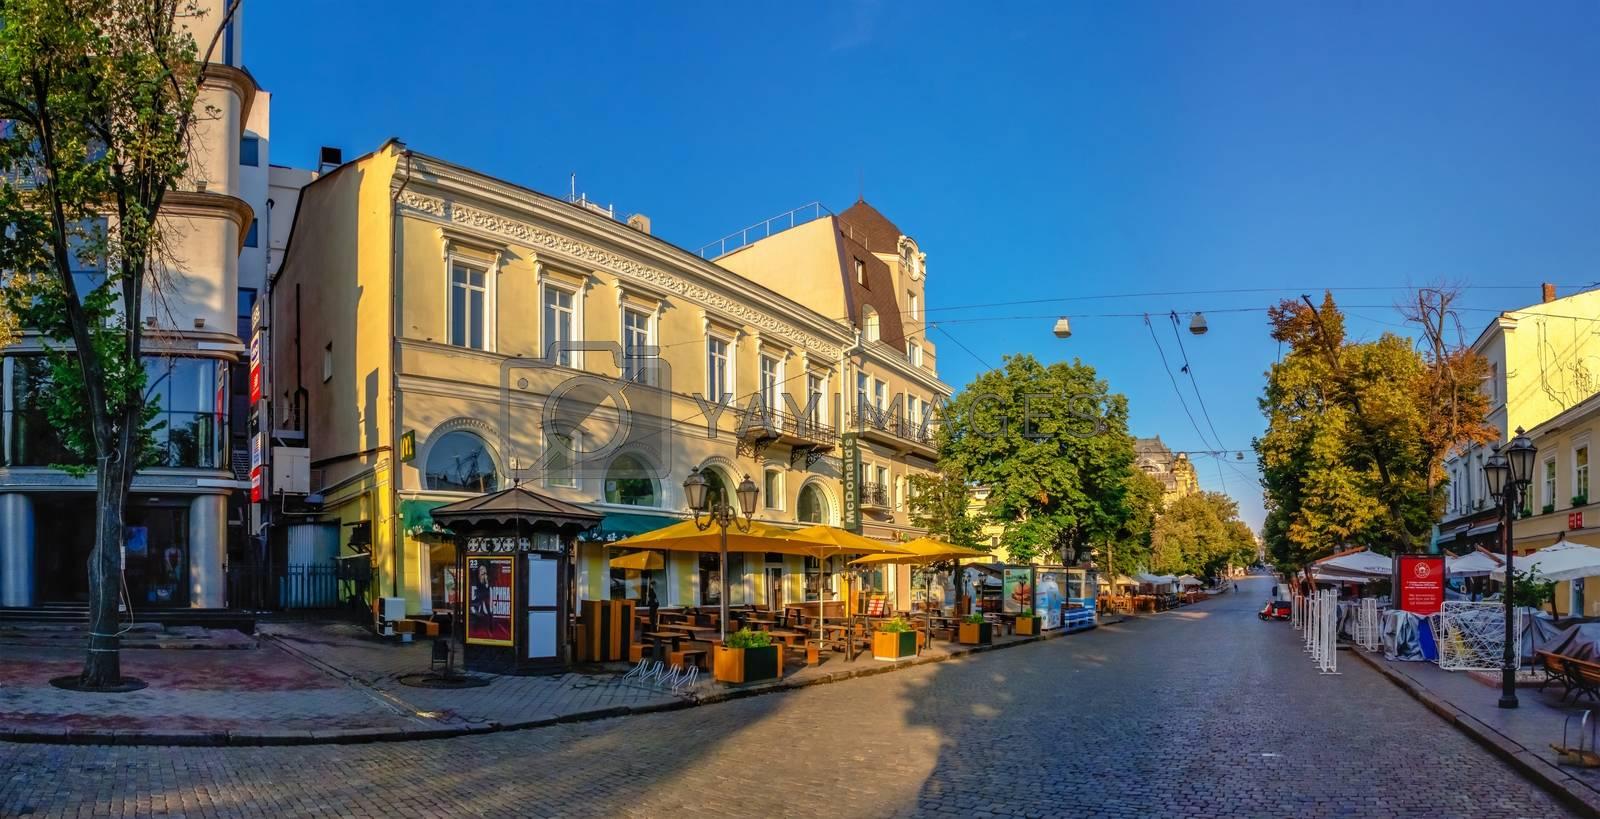 Odessa, Ukraine 06.30.2020. Deribasovskaya street in the historical center of Odessa, Ukraine, on a sunny summer morning